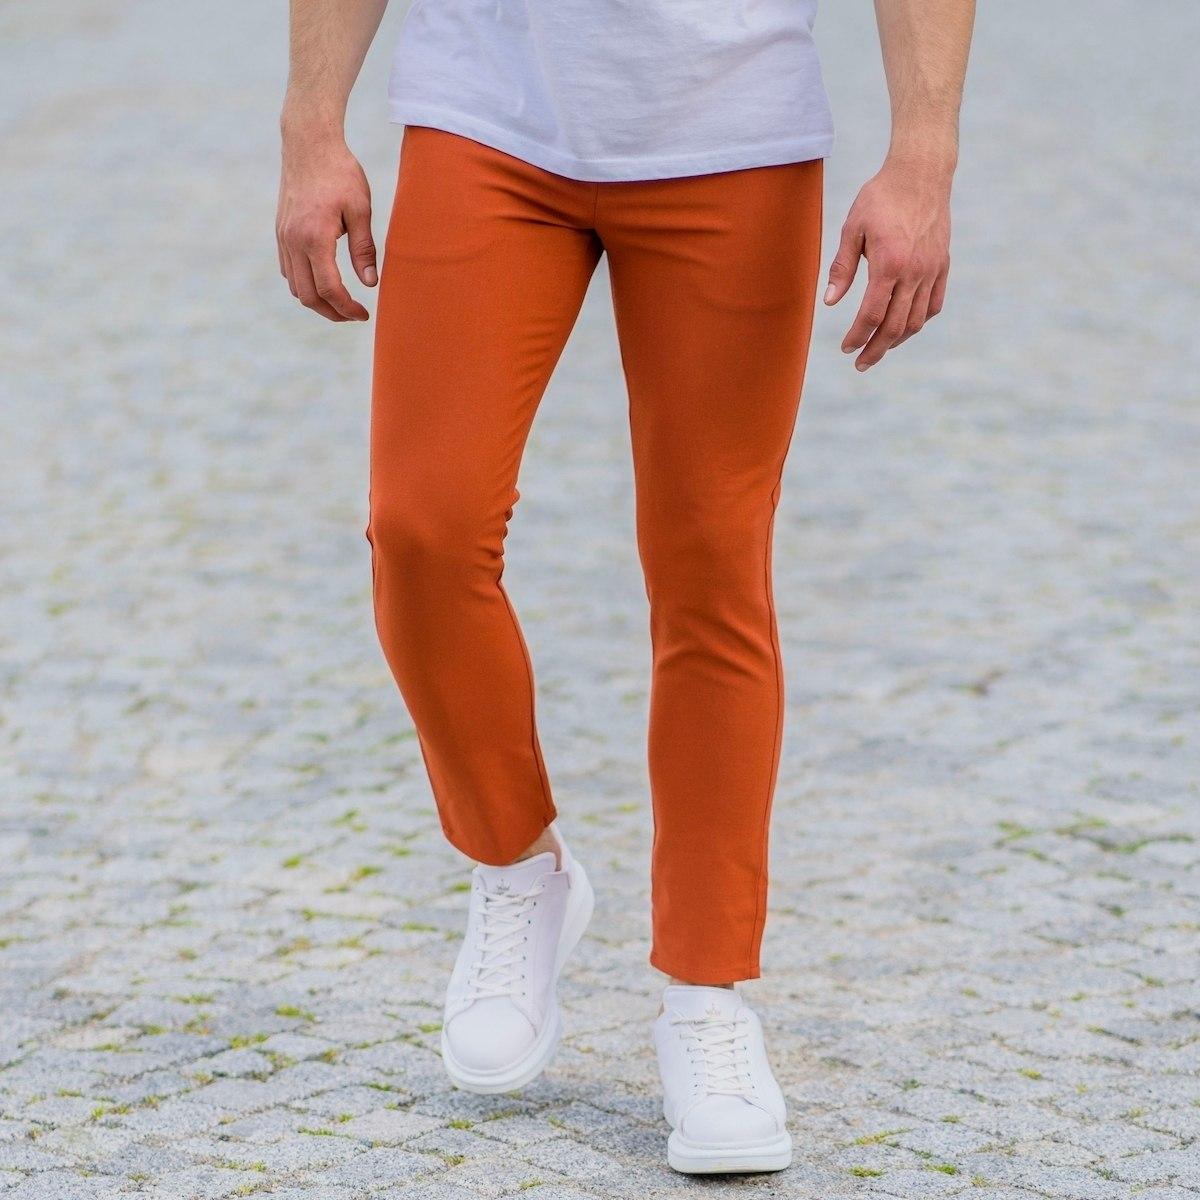 Herren Slim-Fit Hose in orange